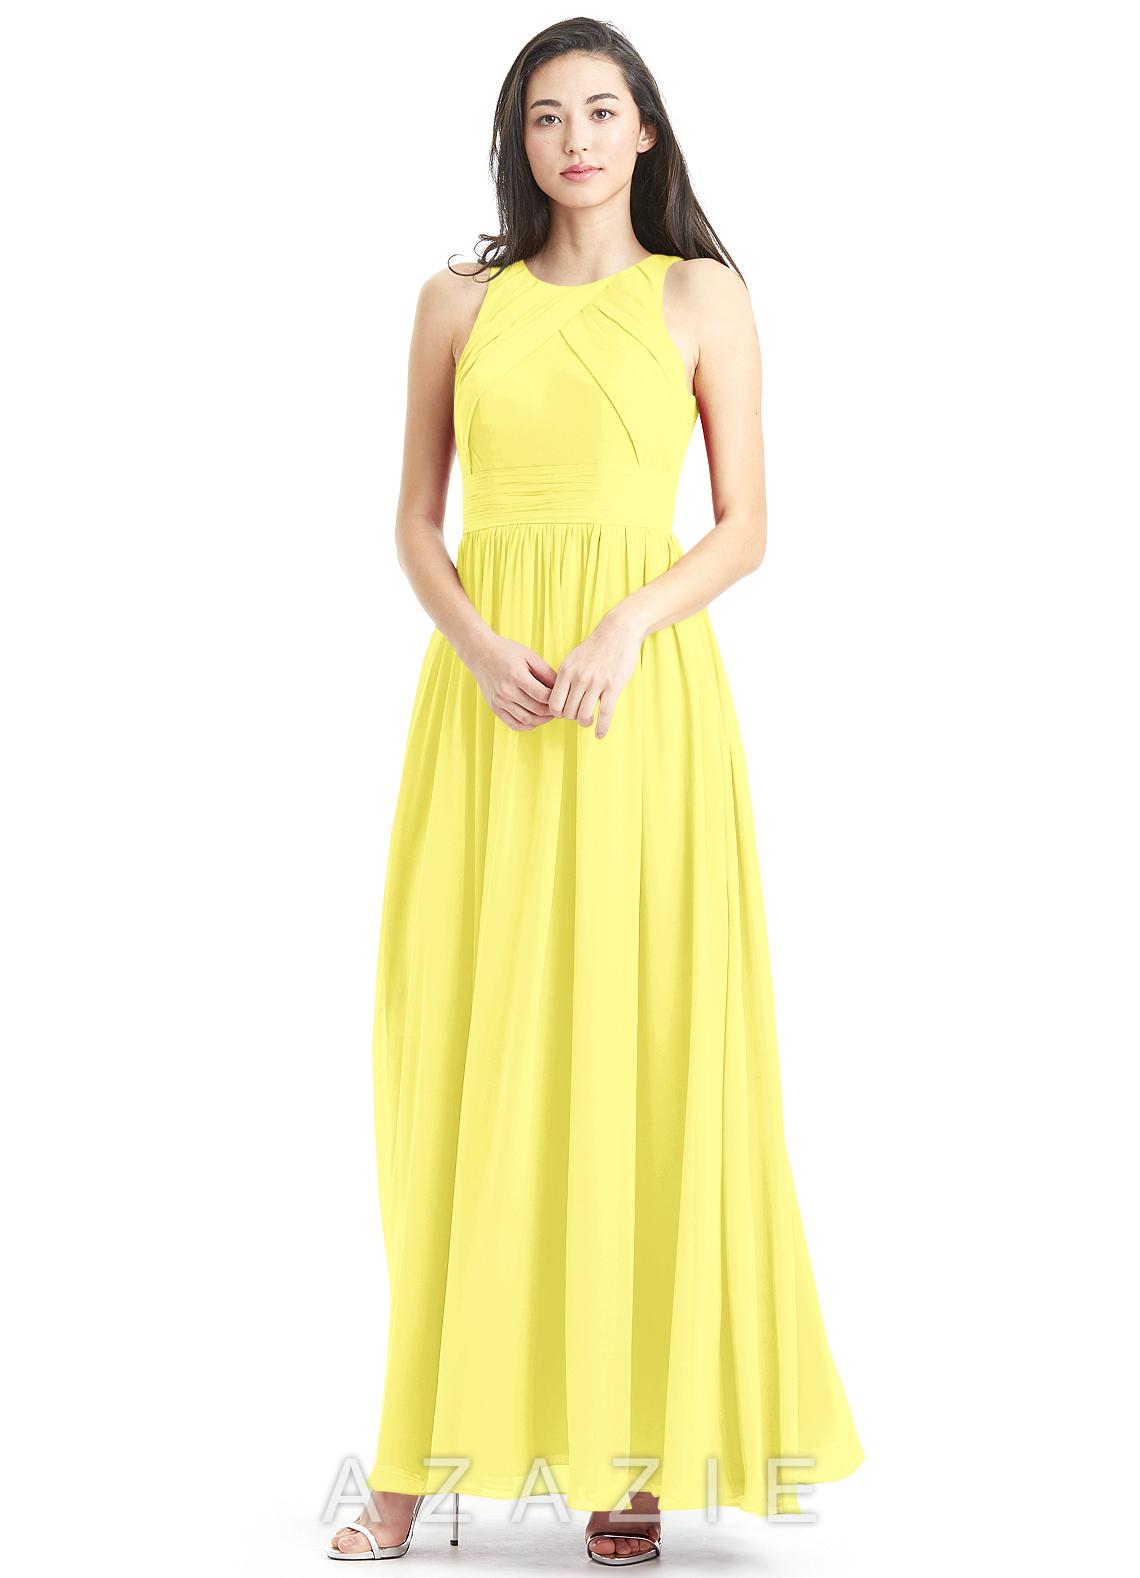 Azazie harper bridesmaid dress azazie color lemon ombrellifo Choice Image